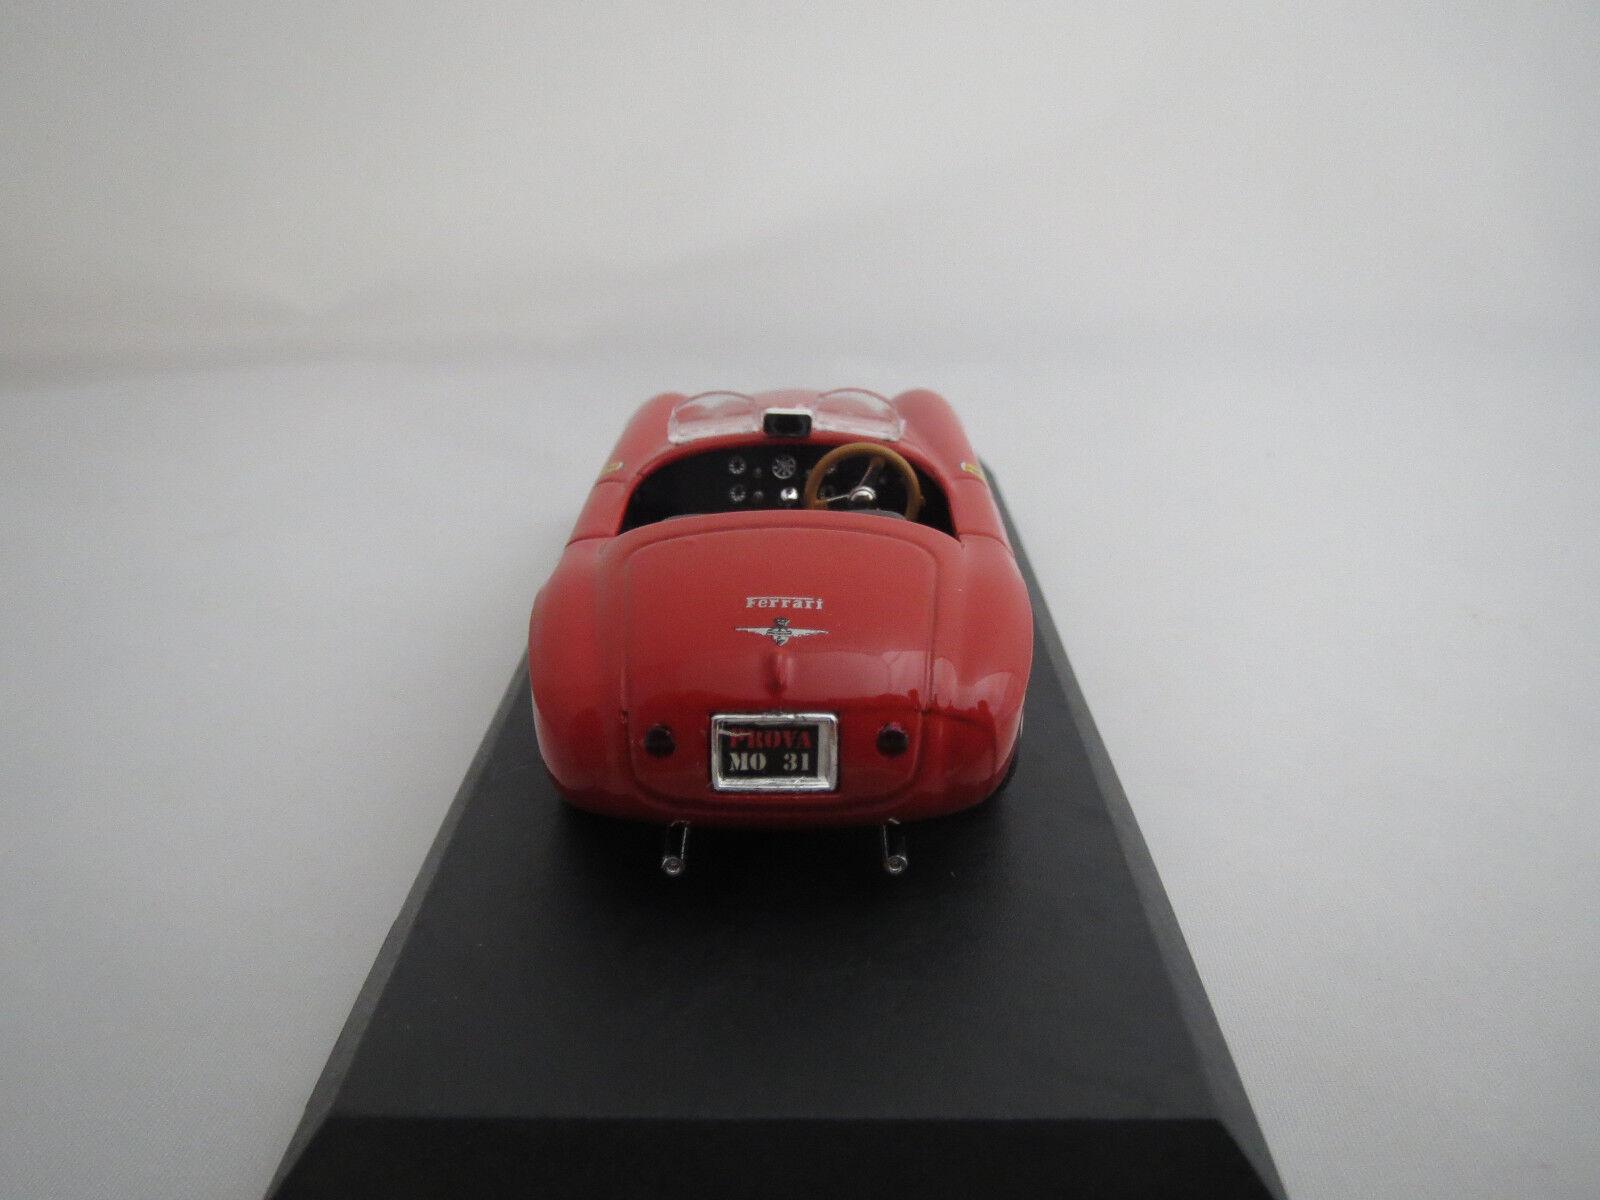 ART Model  Ferrari  166    MM  Spyder-Stradale-Rossa   1948-53   (rot)  1 43 OVP  | Deutschland München  8b43dd